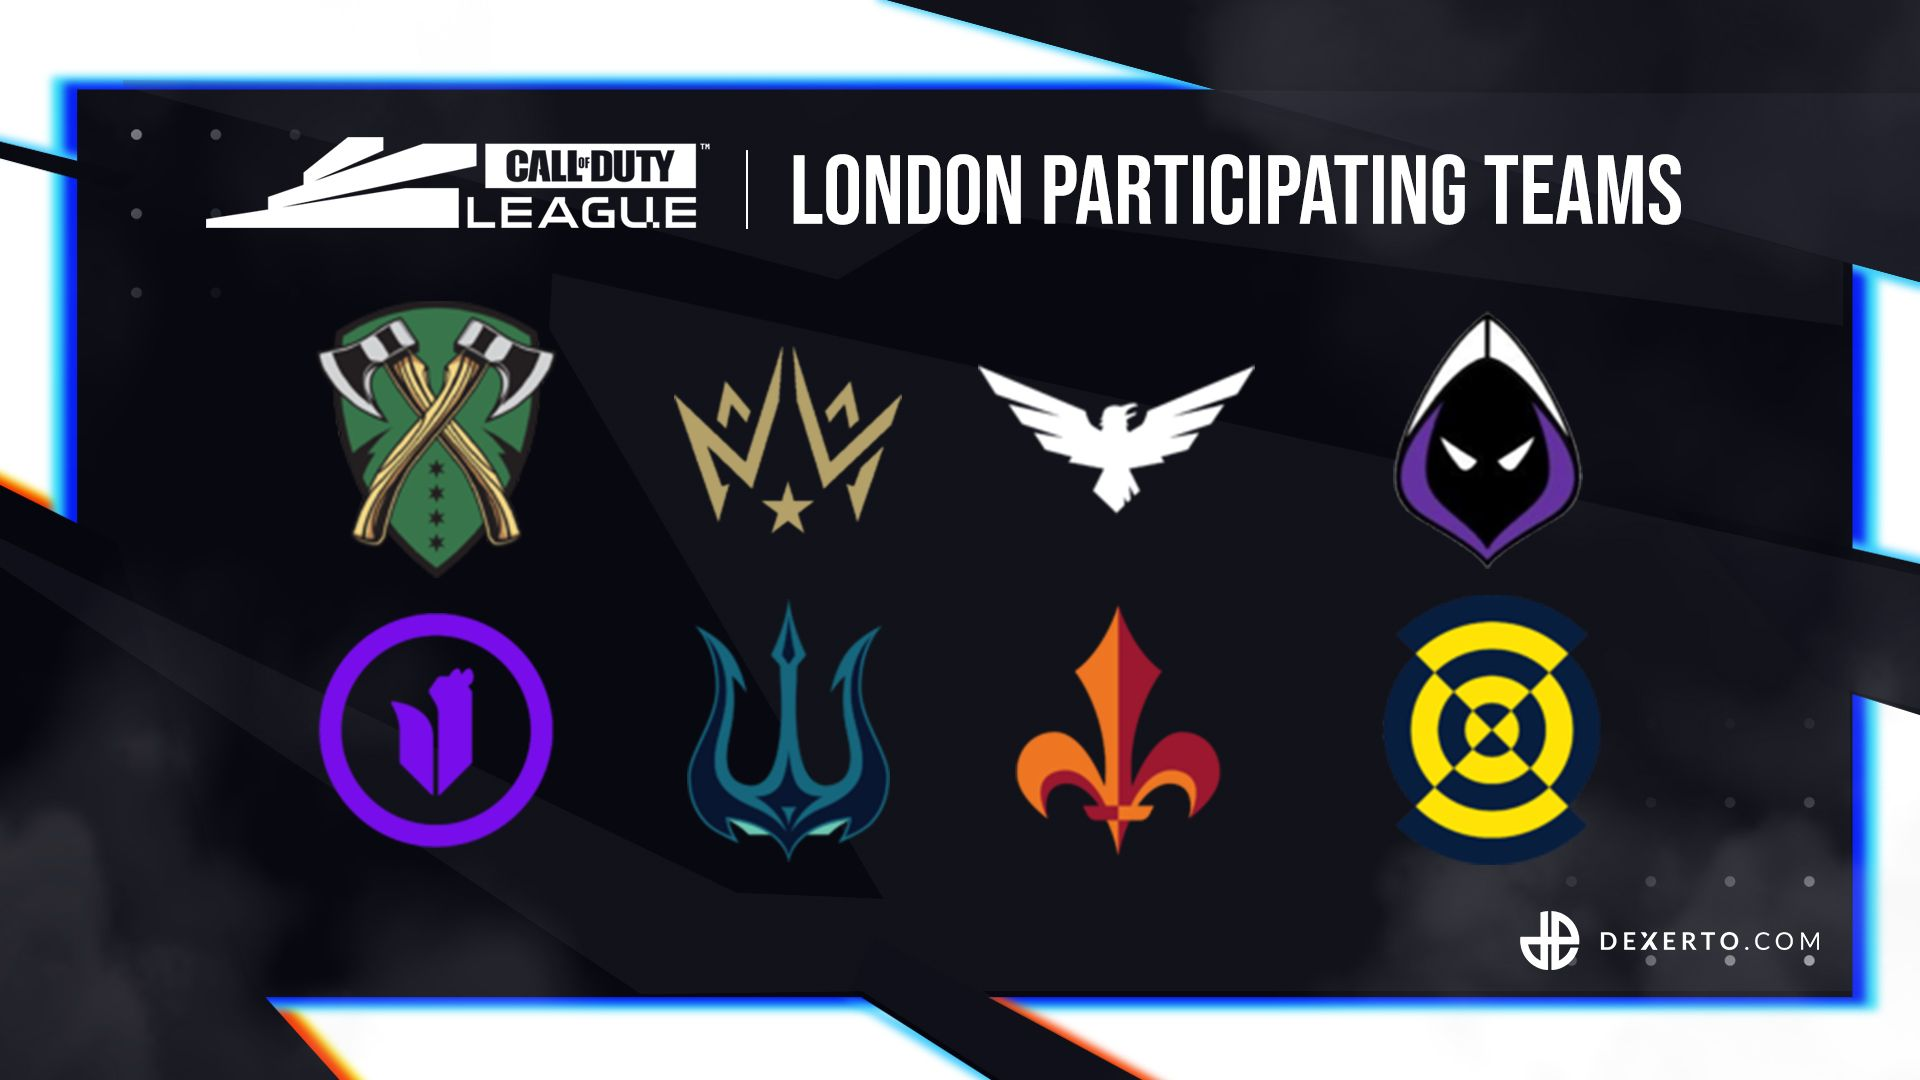 CDL London's teams.